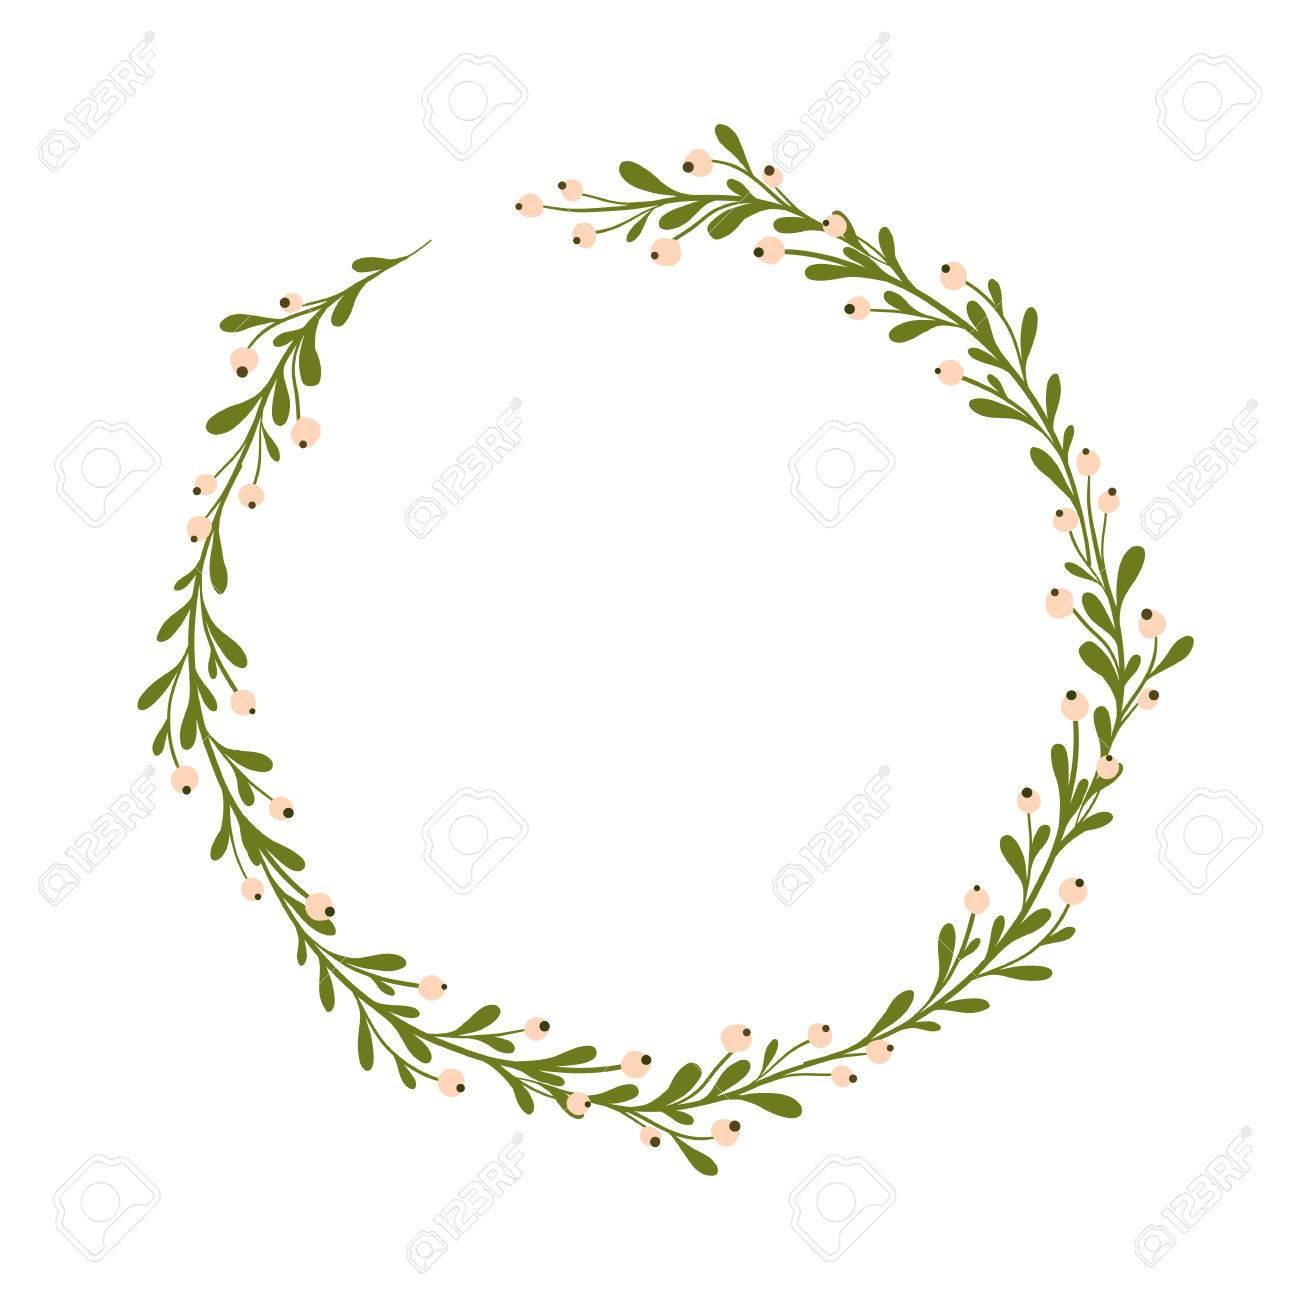 Cute And Gentle Handsketched Mistletoe Wreath Seasonal Background 1300x1300